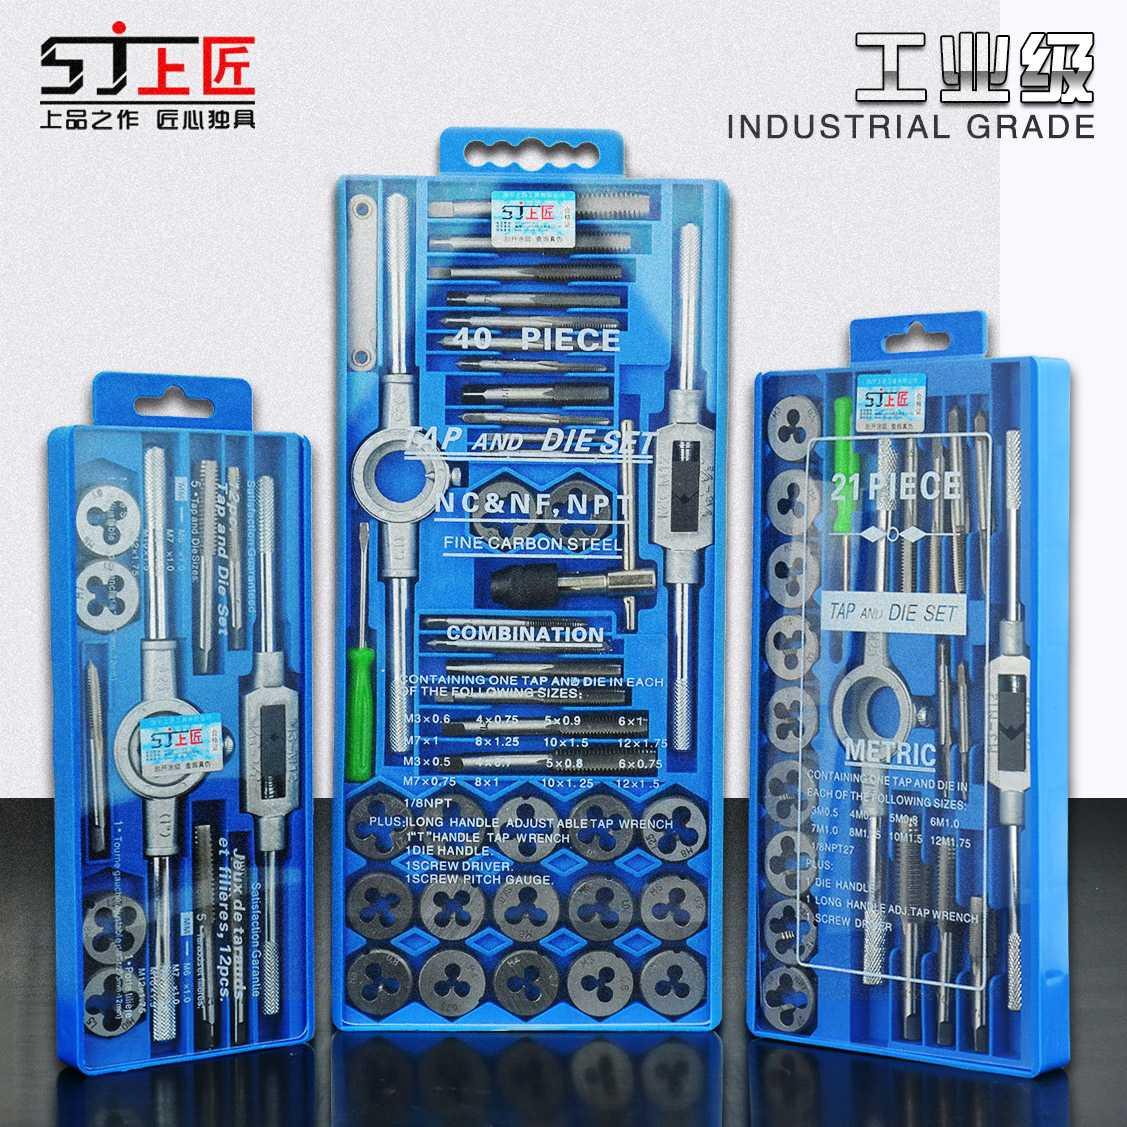 Tap diestock set thread threading tool metric tap and die set hand machine